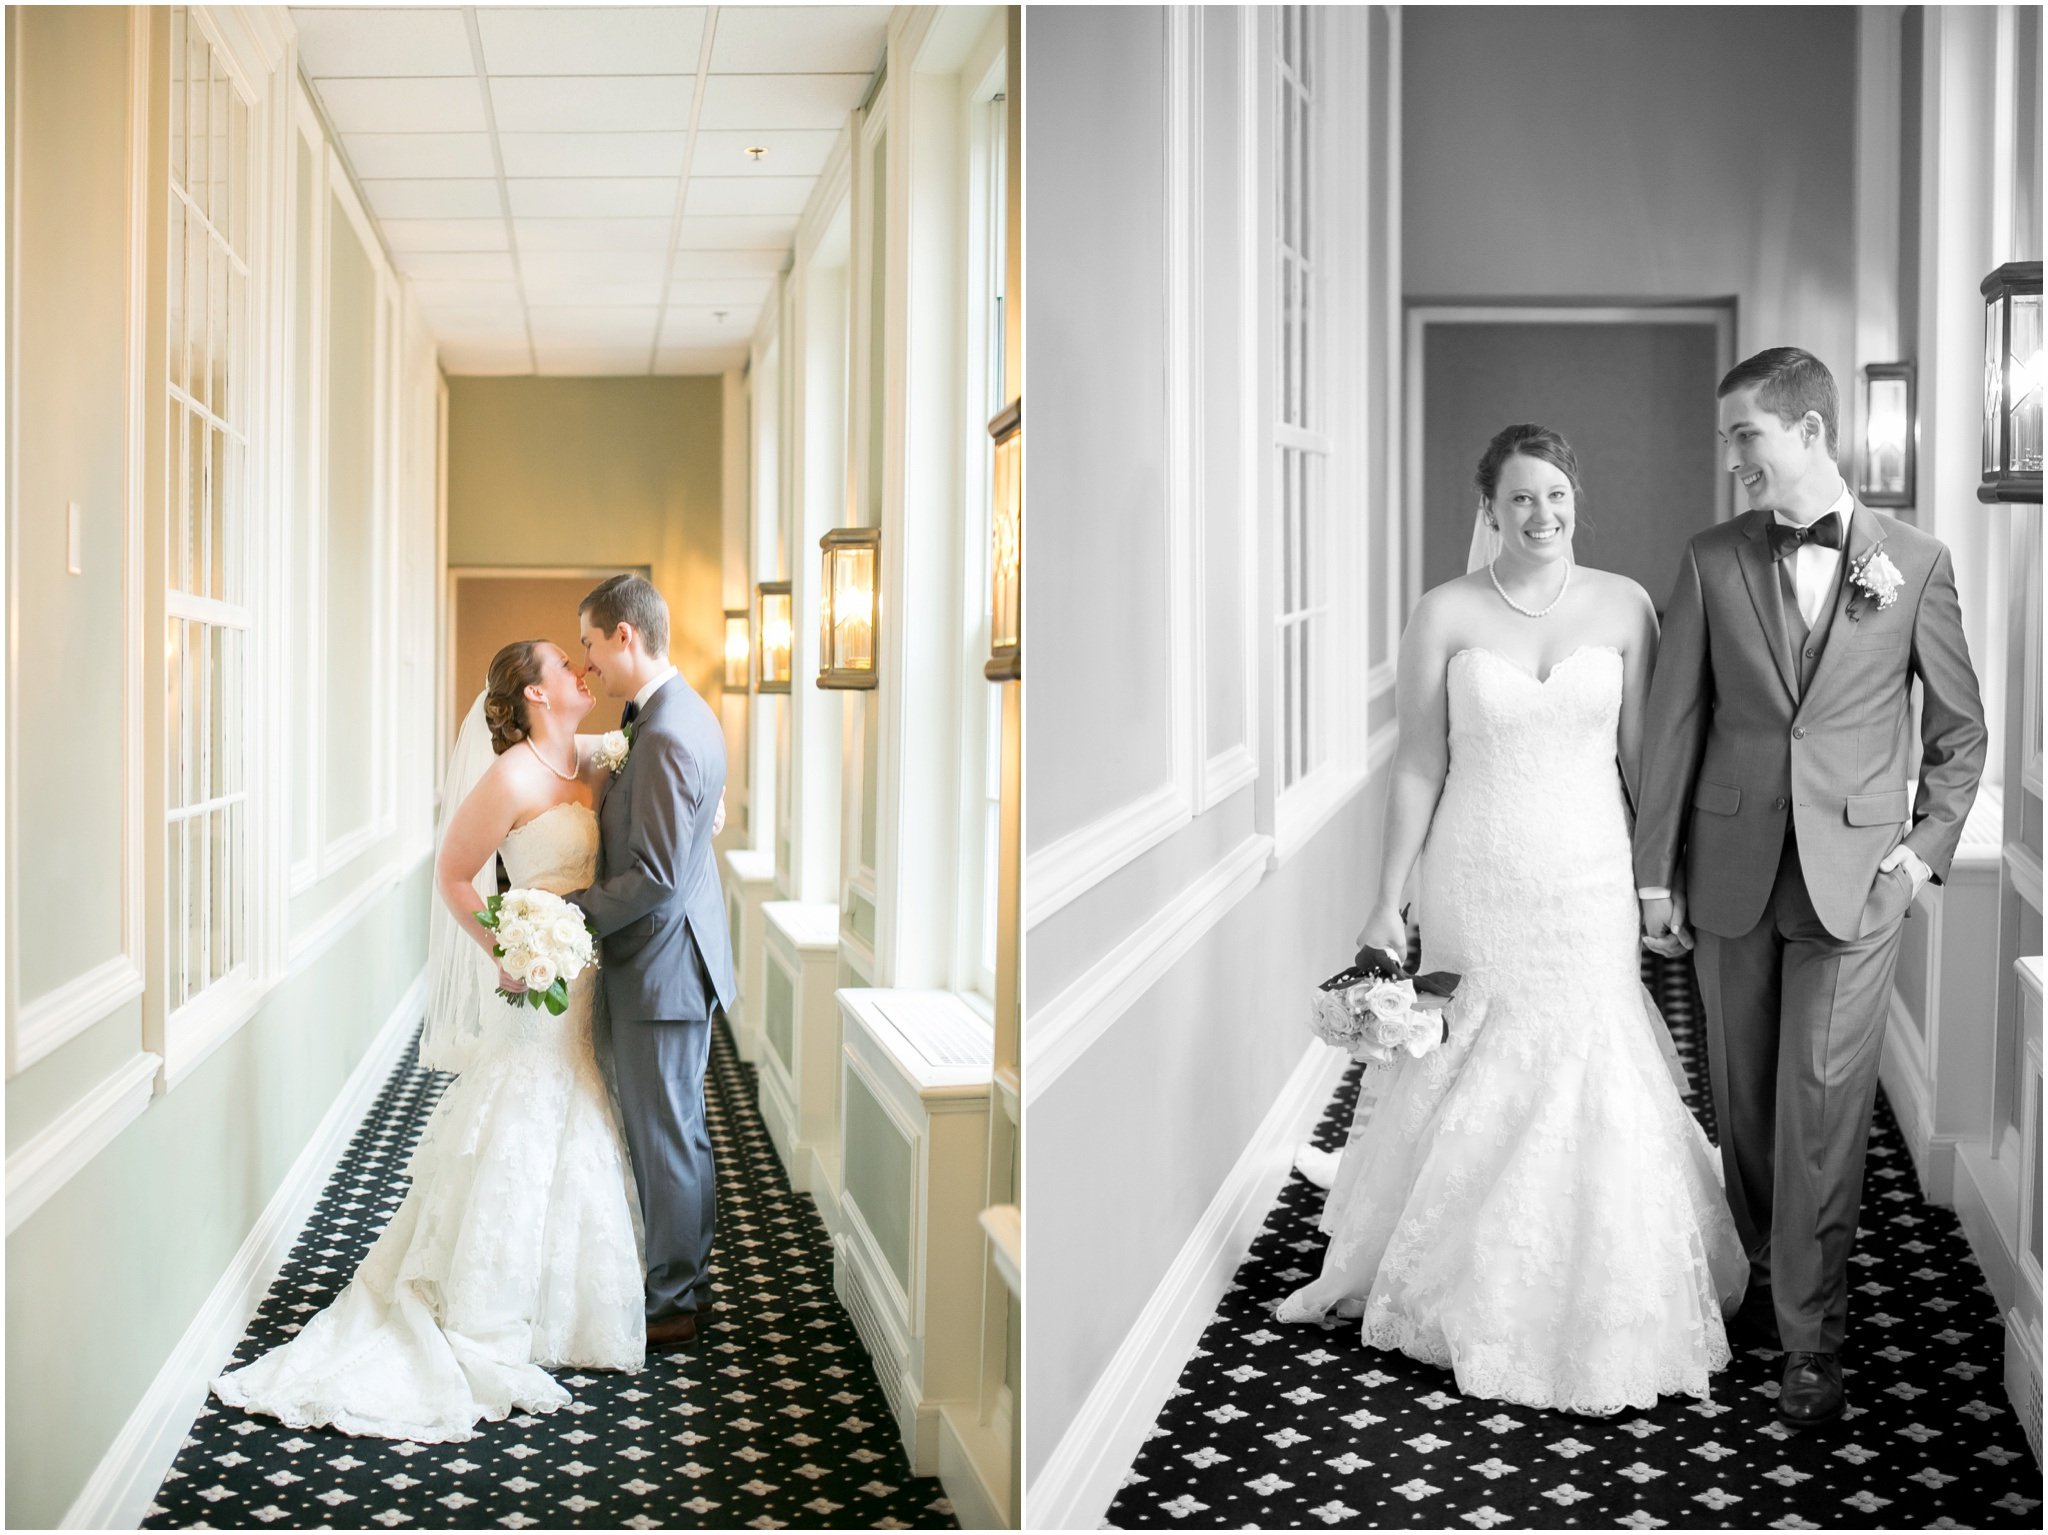 Madison_Club_Madison_Wisconsin_Wedding_Photographer_Spring_Rainy_Wedding_2640.jpg